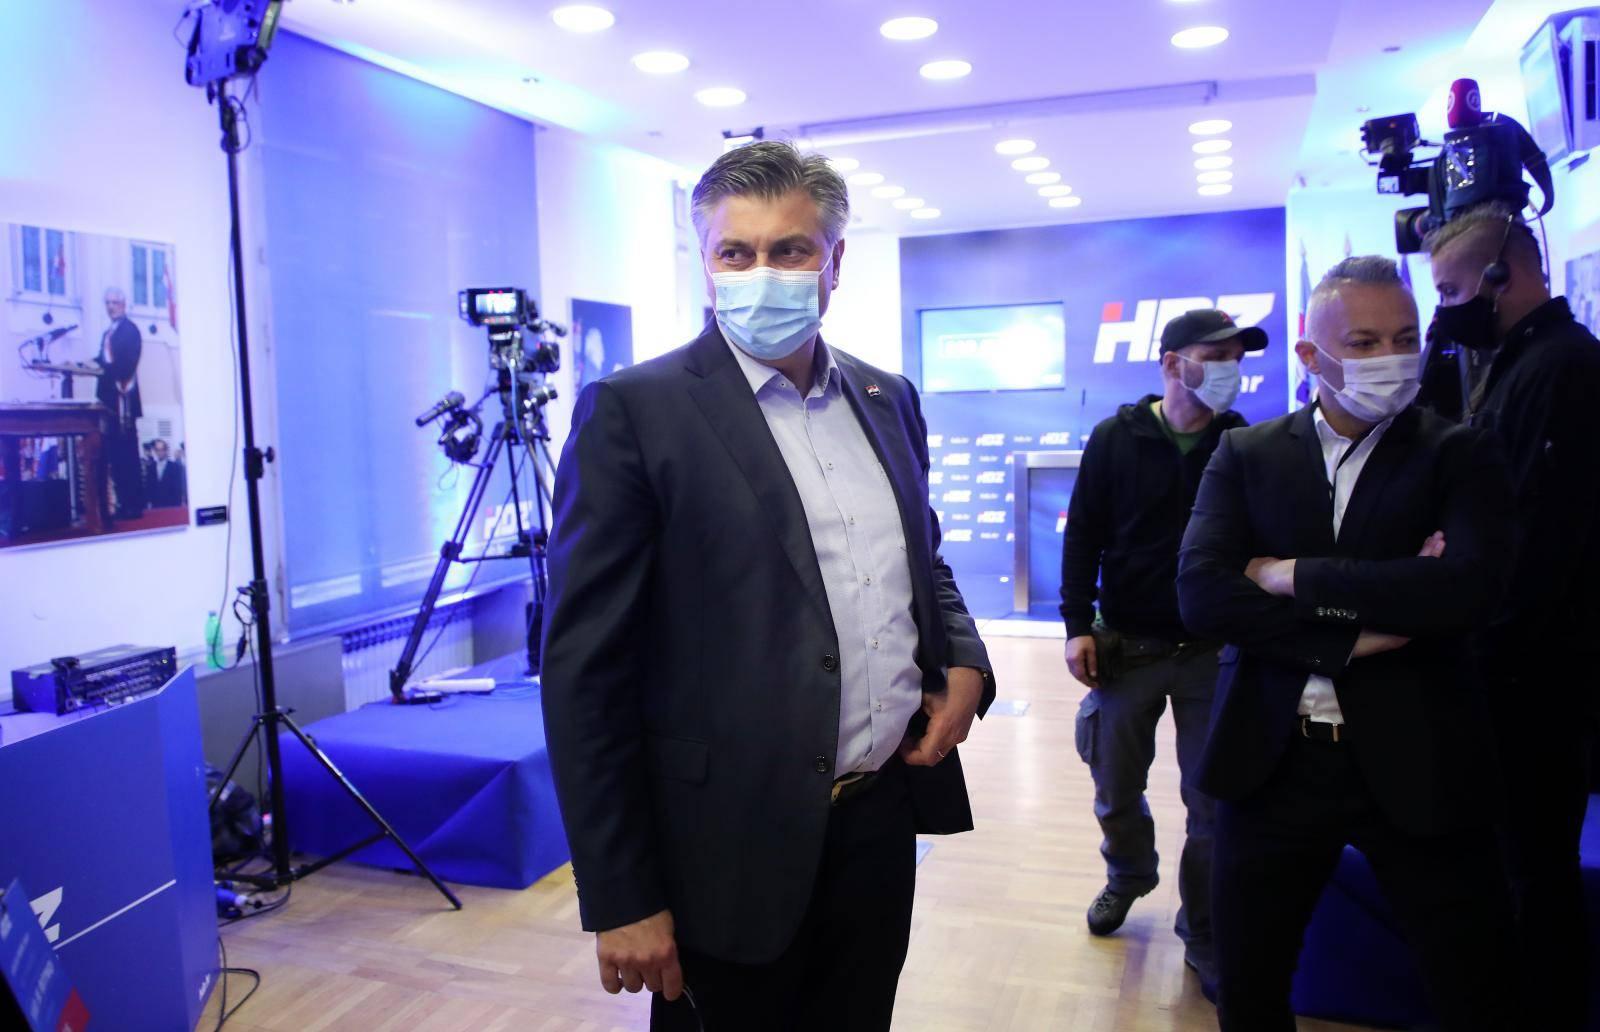 Izborni stožer kandidata za gradonačelnika Zagreba Davora Filipovića